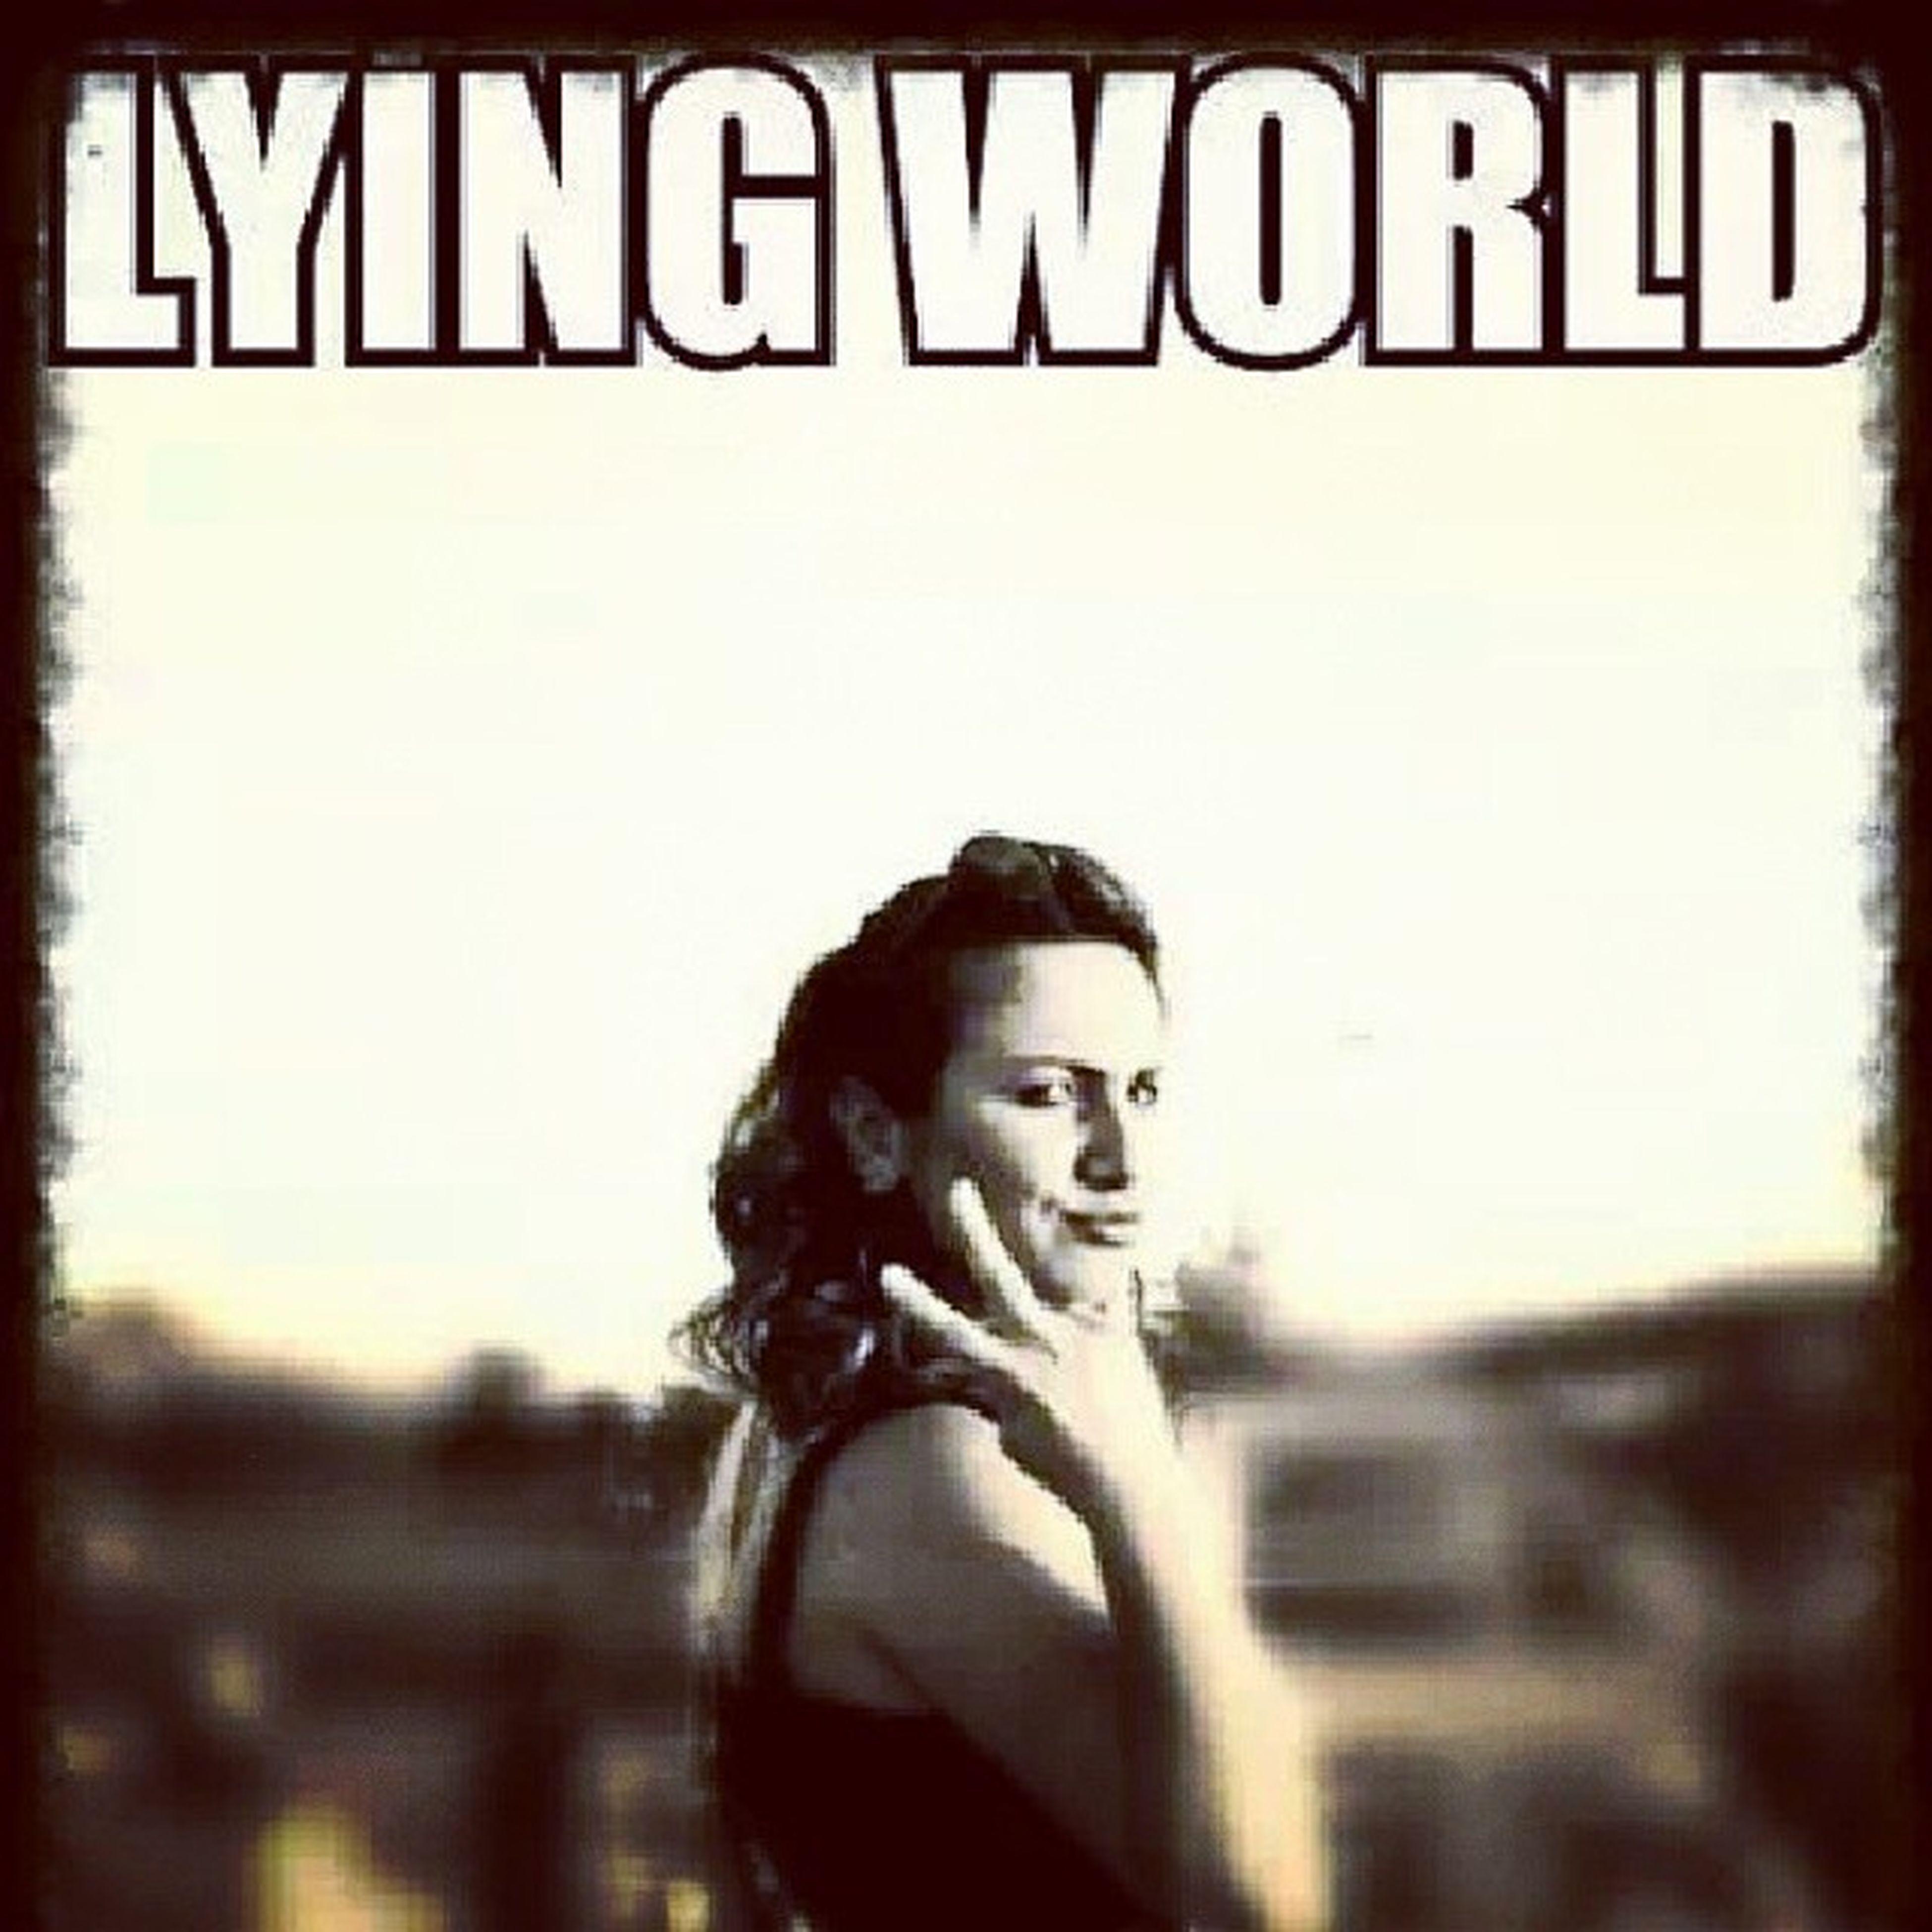 Lyingworld